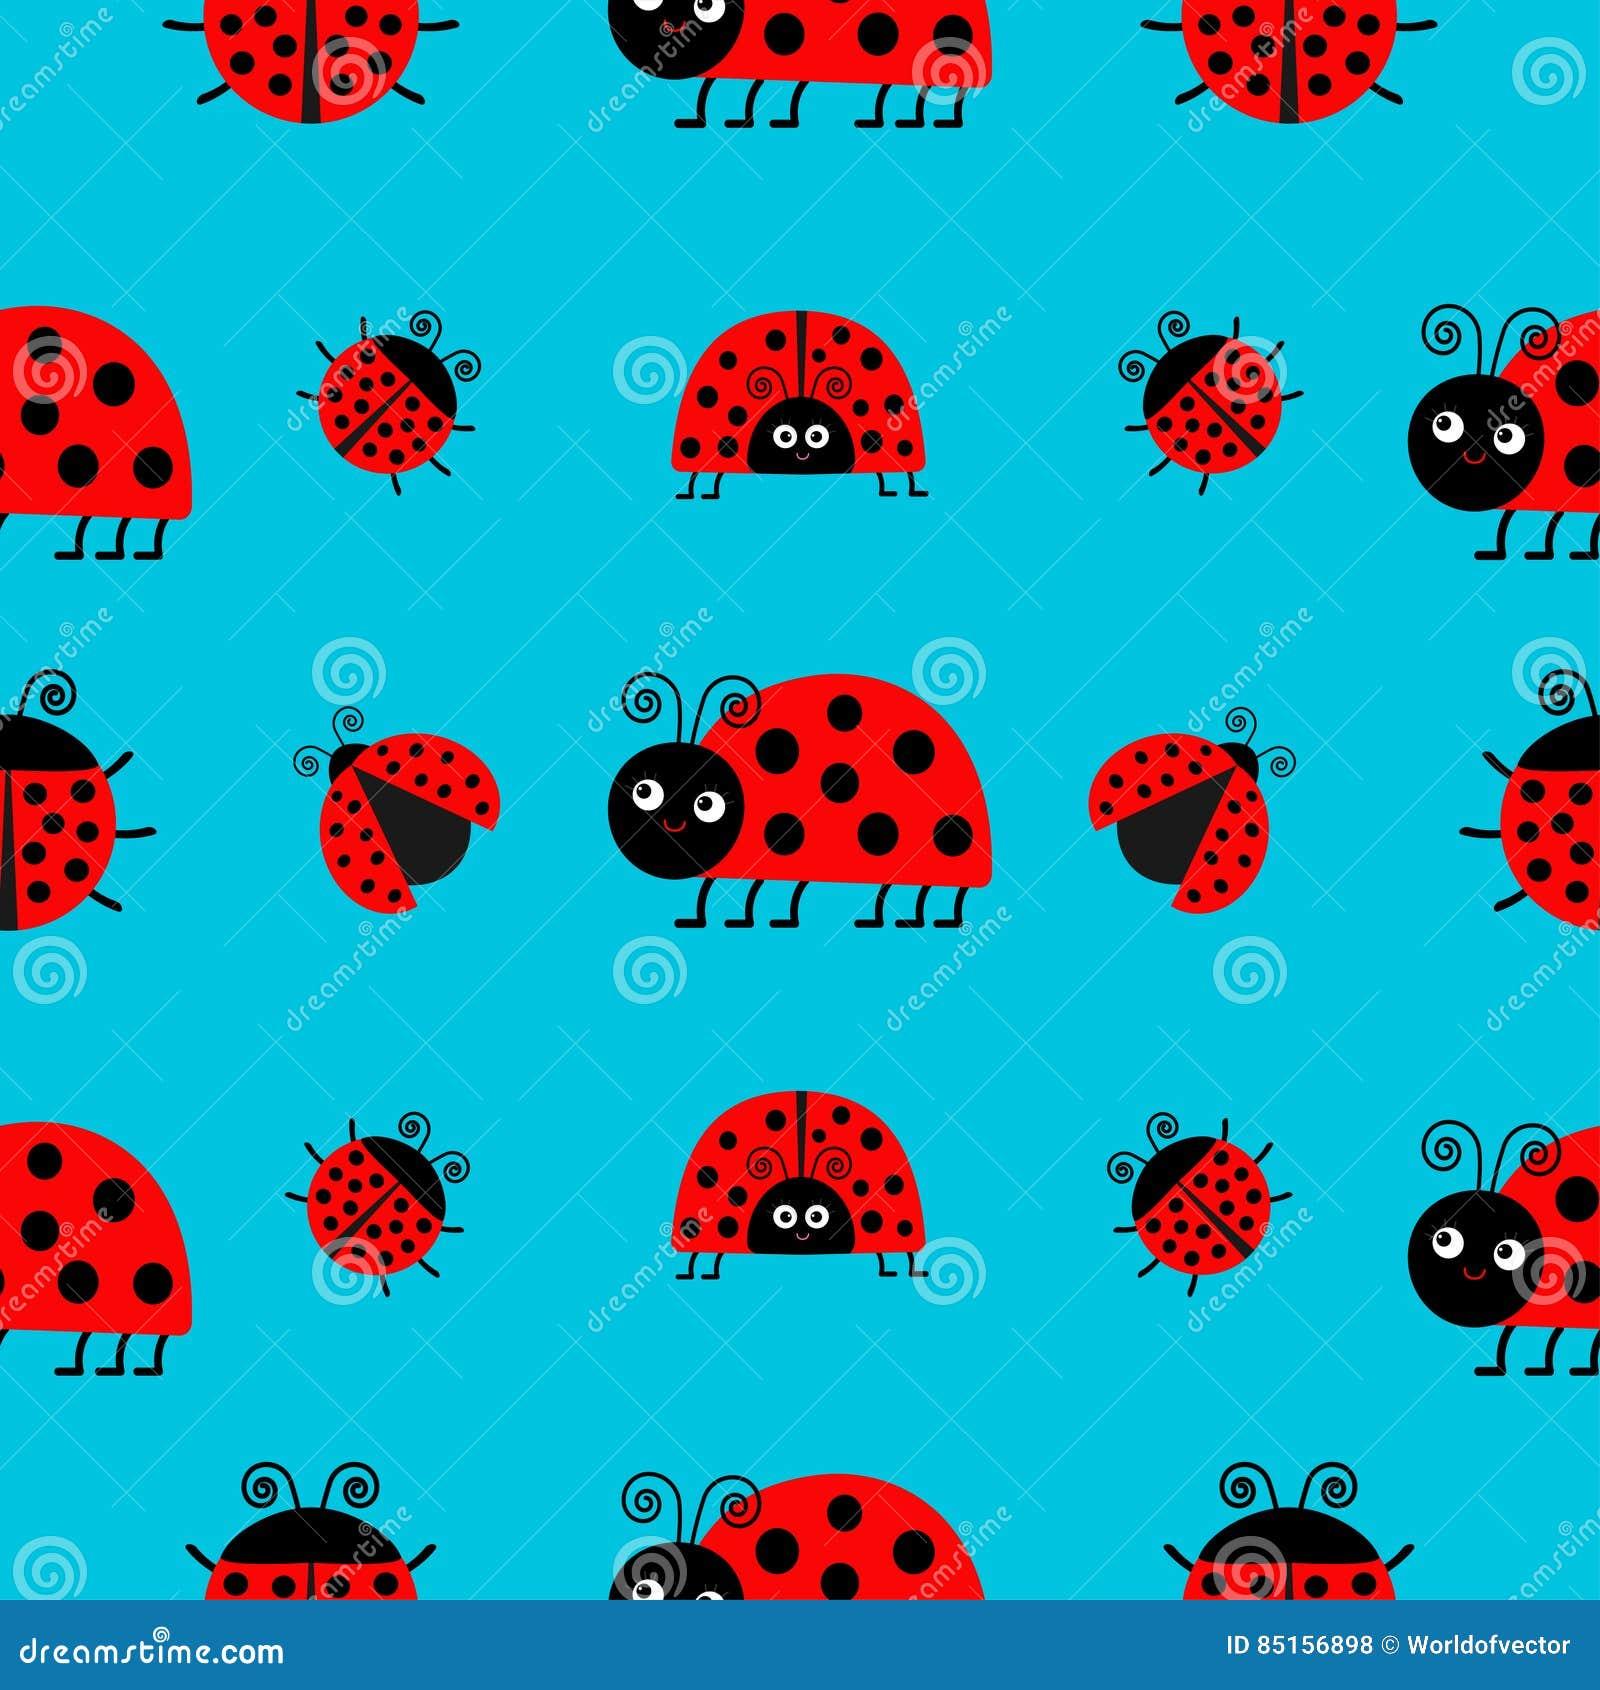 ladybug ladybird icon set baby collection funny insect seamless